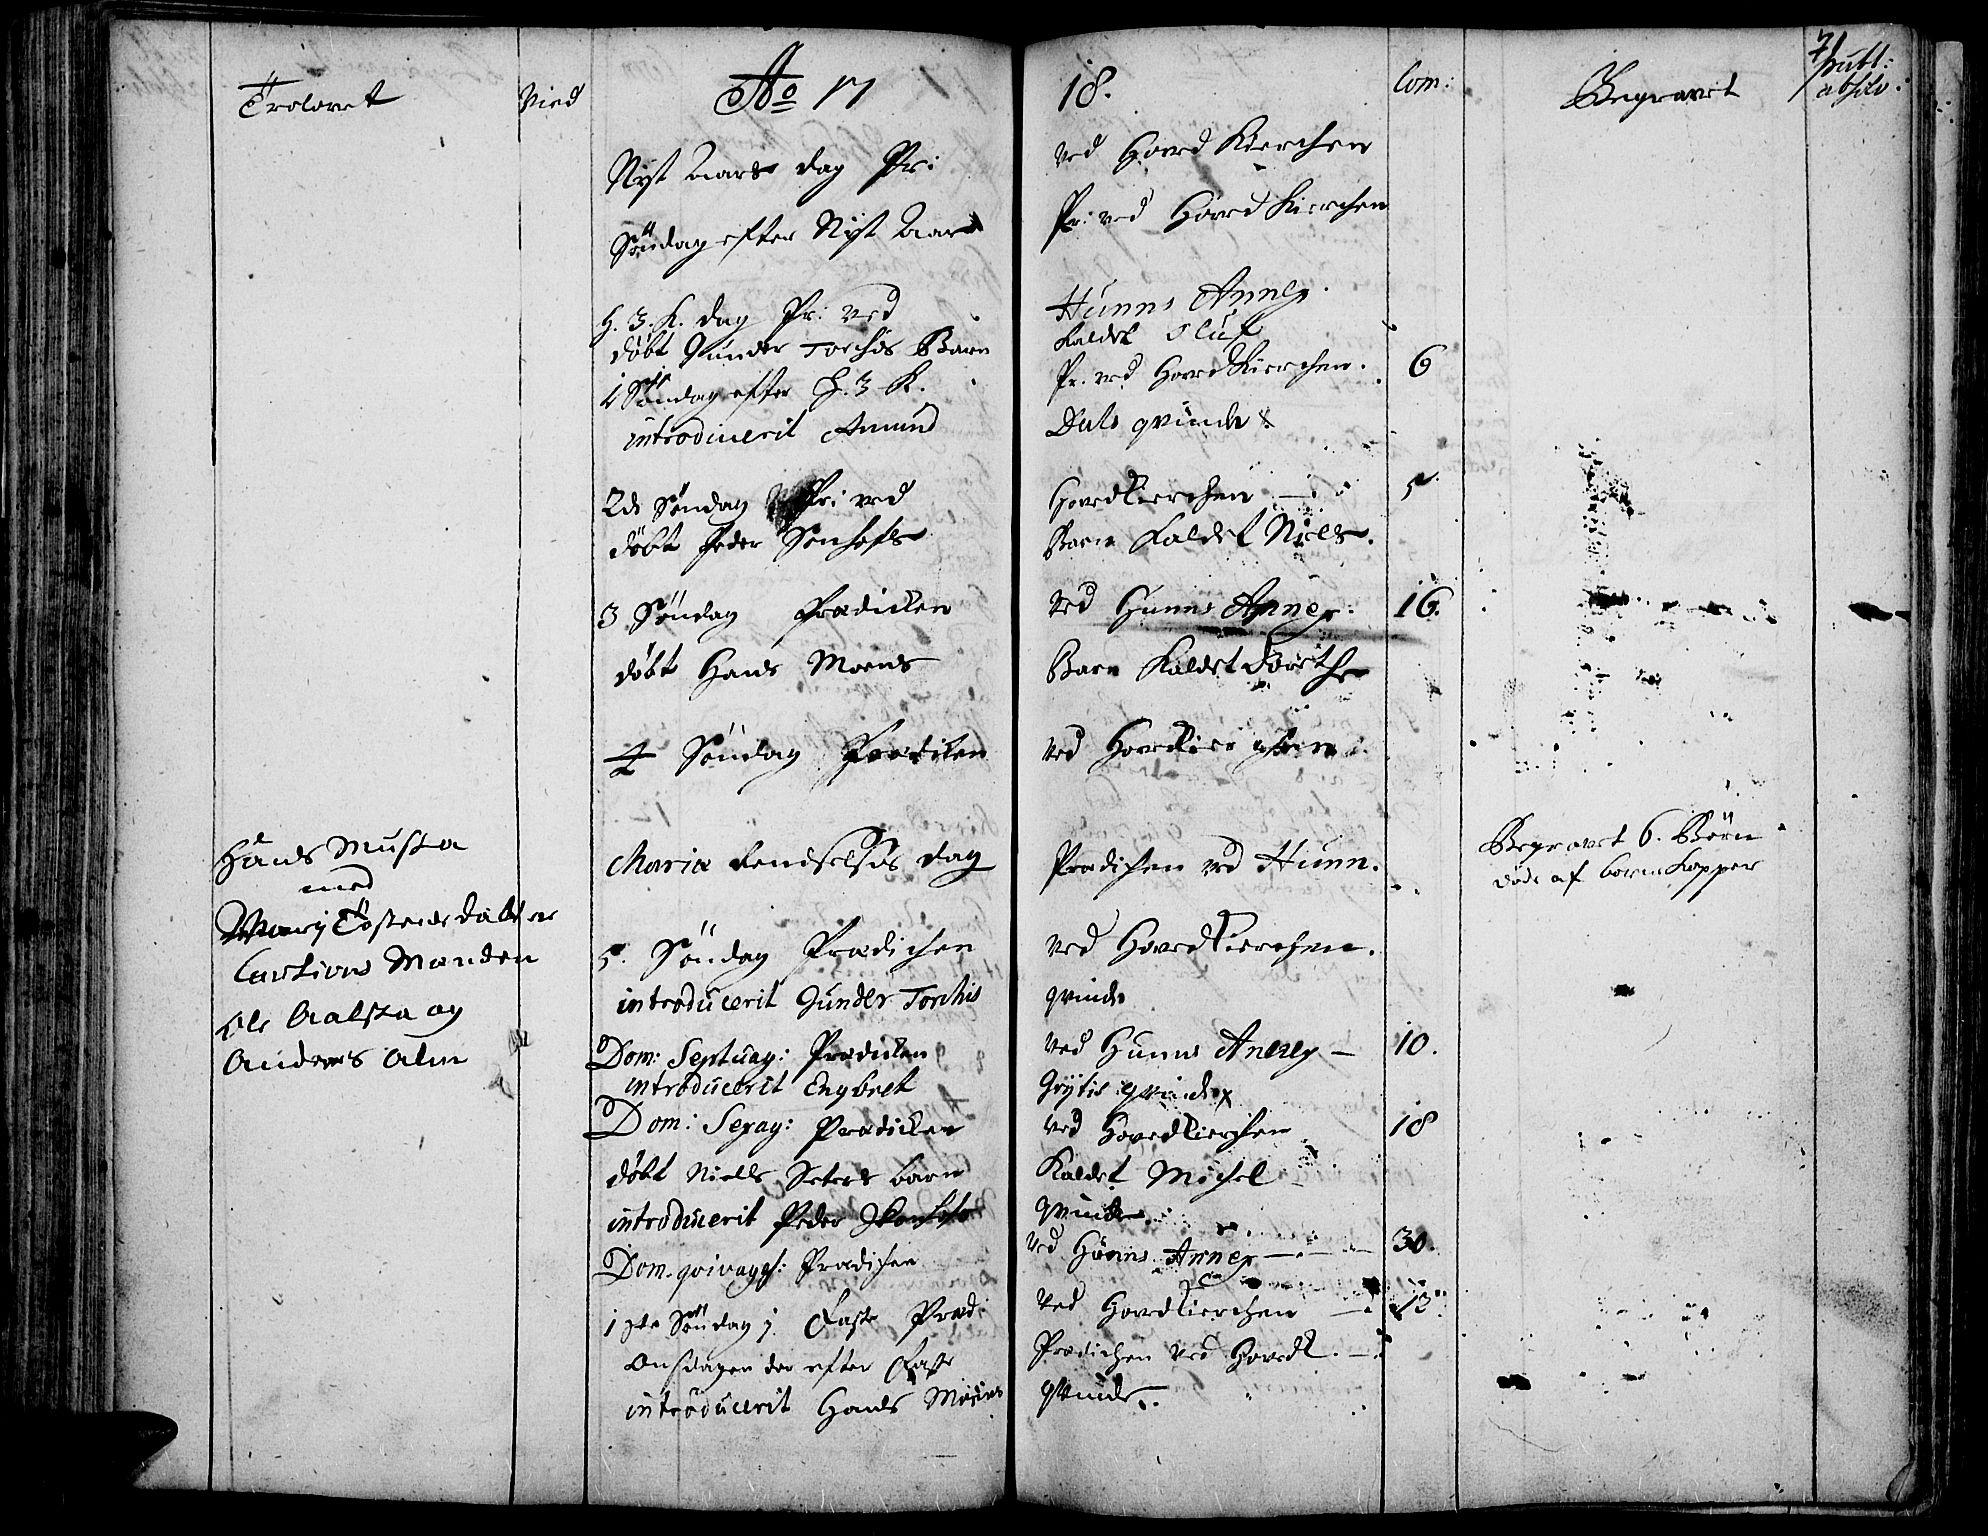 SAH, Vardal prestekontor, H/Ha/Haa/L0001: Ministerialbok nr. 1, 1706-1748, s. 71